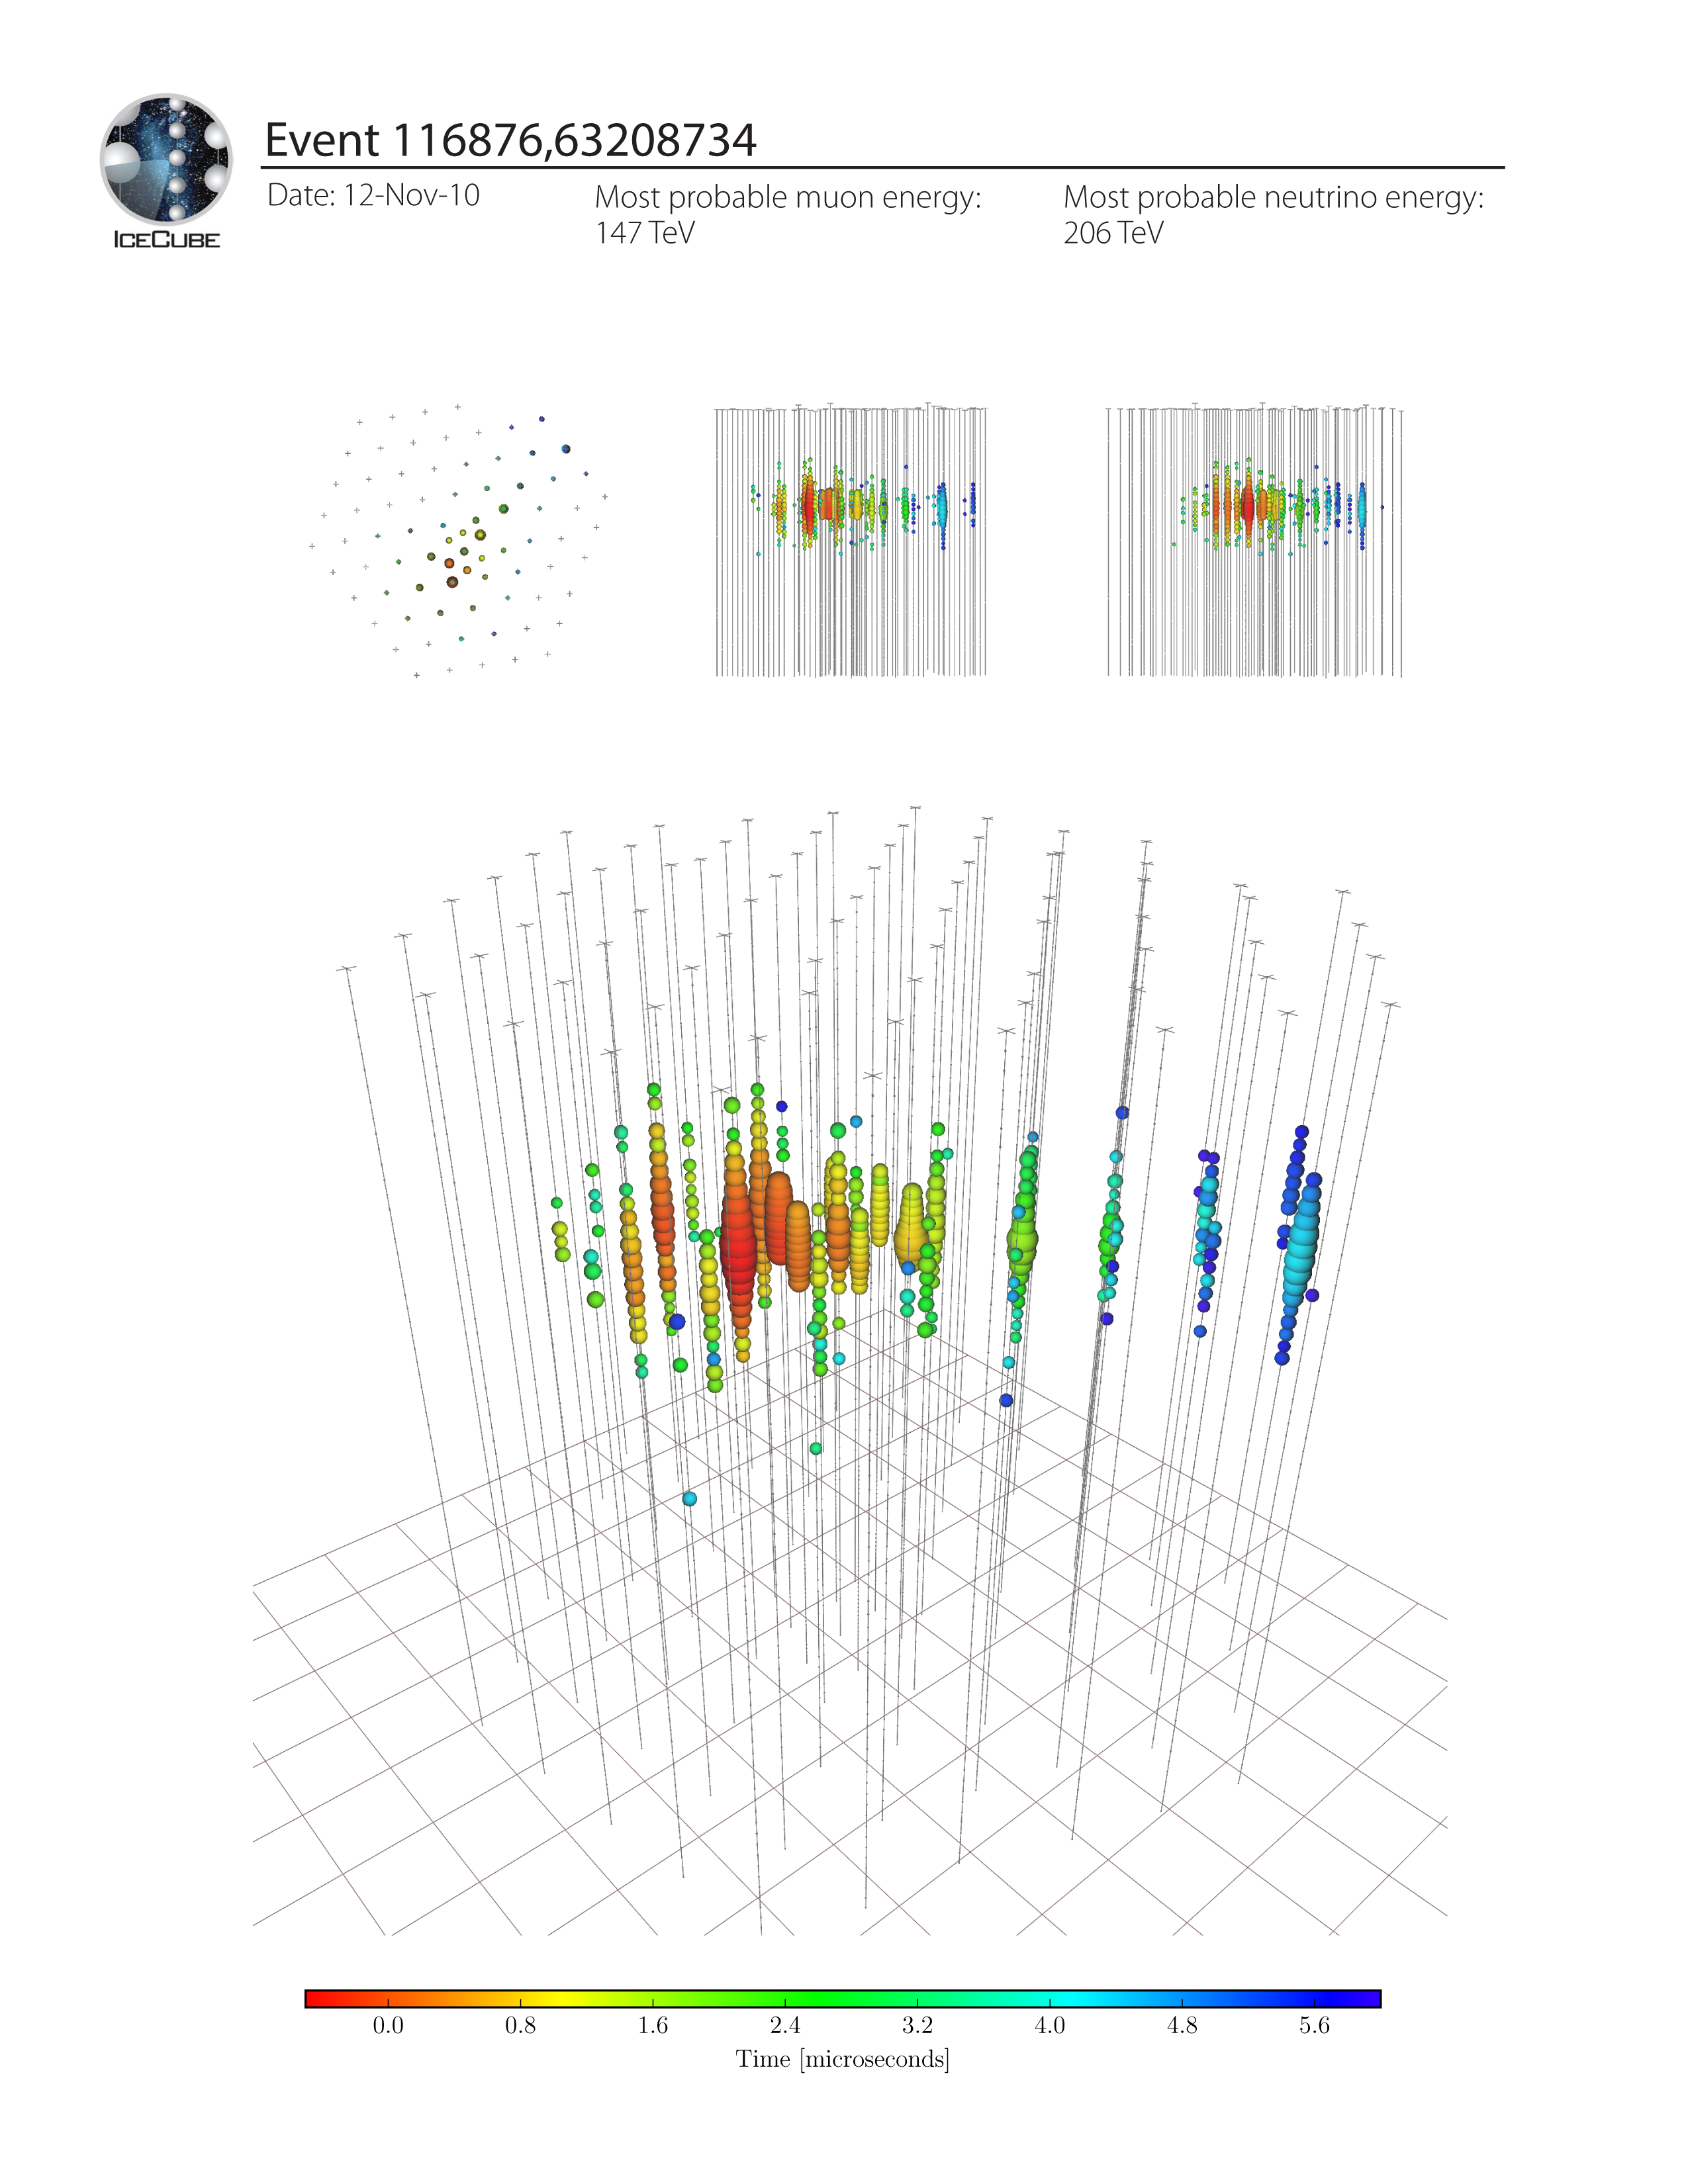 IceCube Event ID 116876,63208734. Most probable neutrino energy: 206 TeV, November 12, 2010